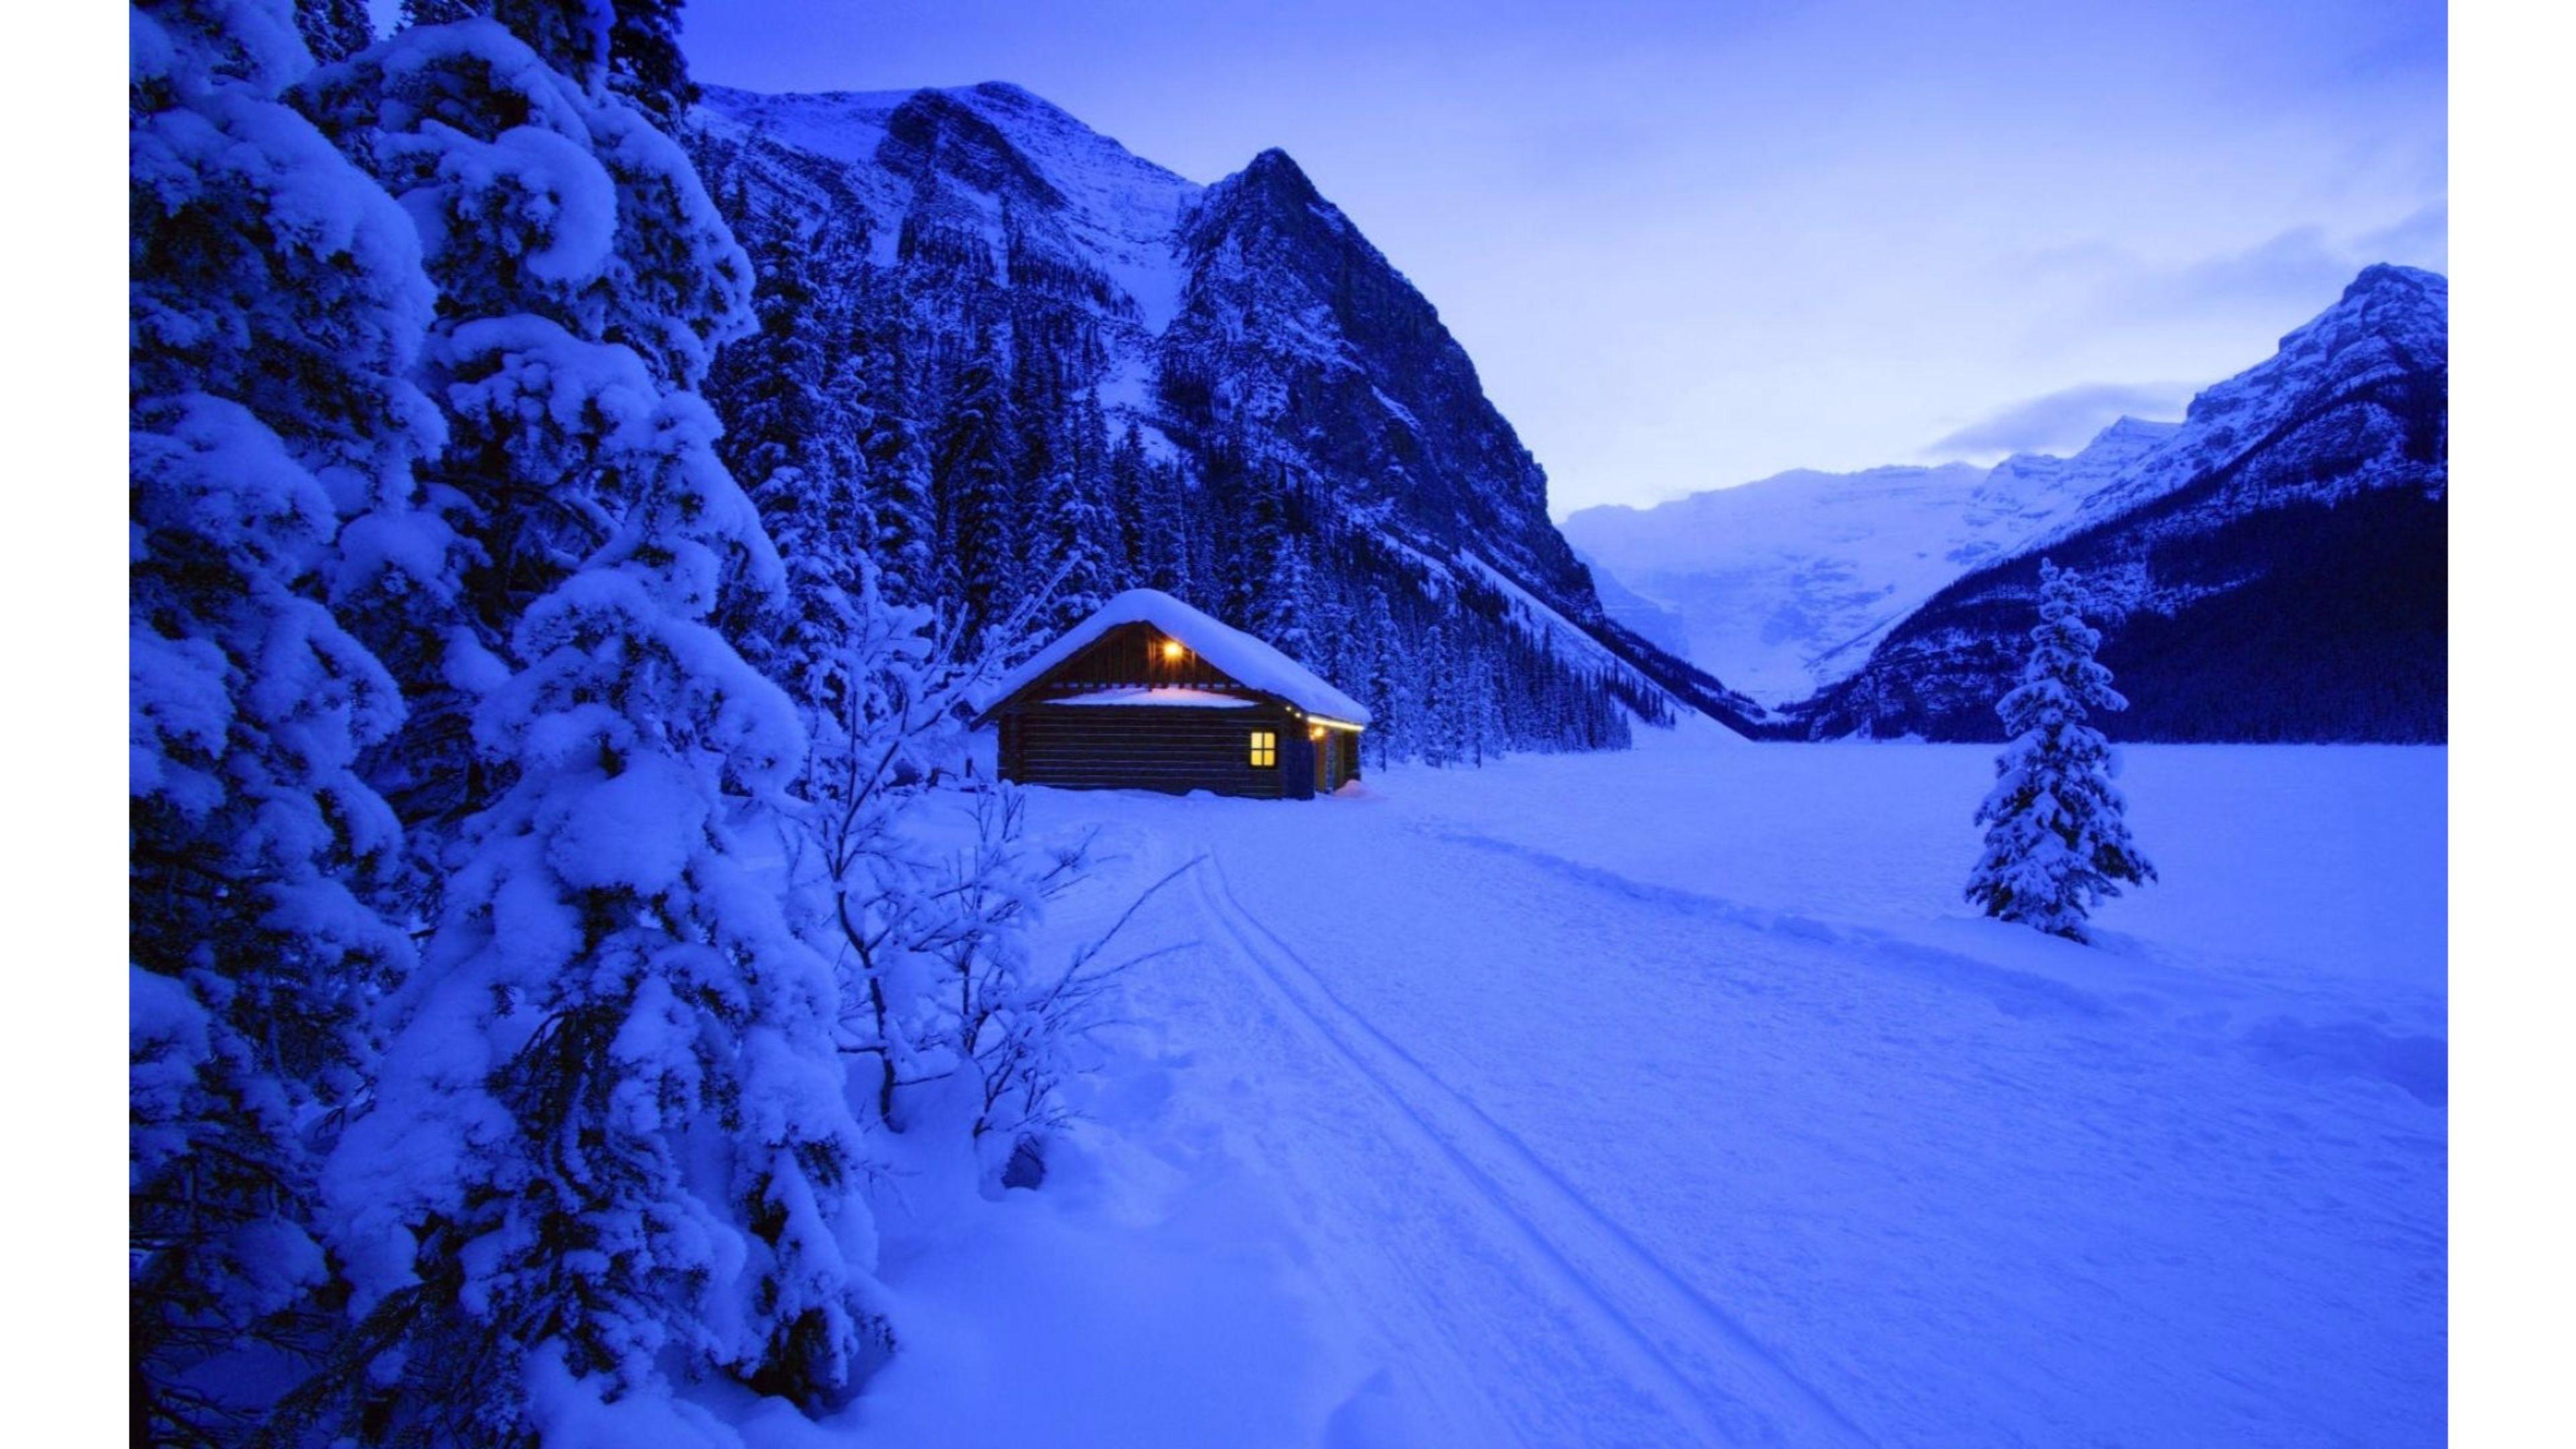 3840x2160 Peaceful Night 4k Winter Wallpaper Data Lake Louise 3840x2160 Wallpaper Teahub Io